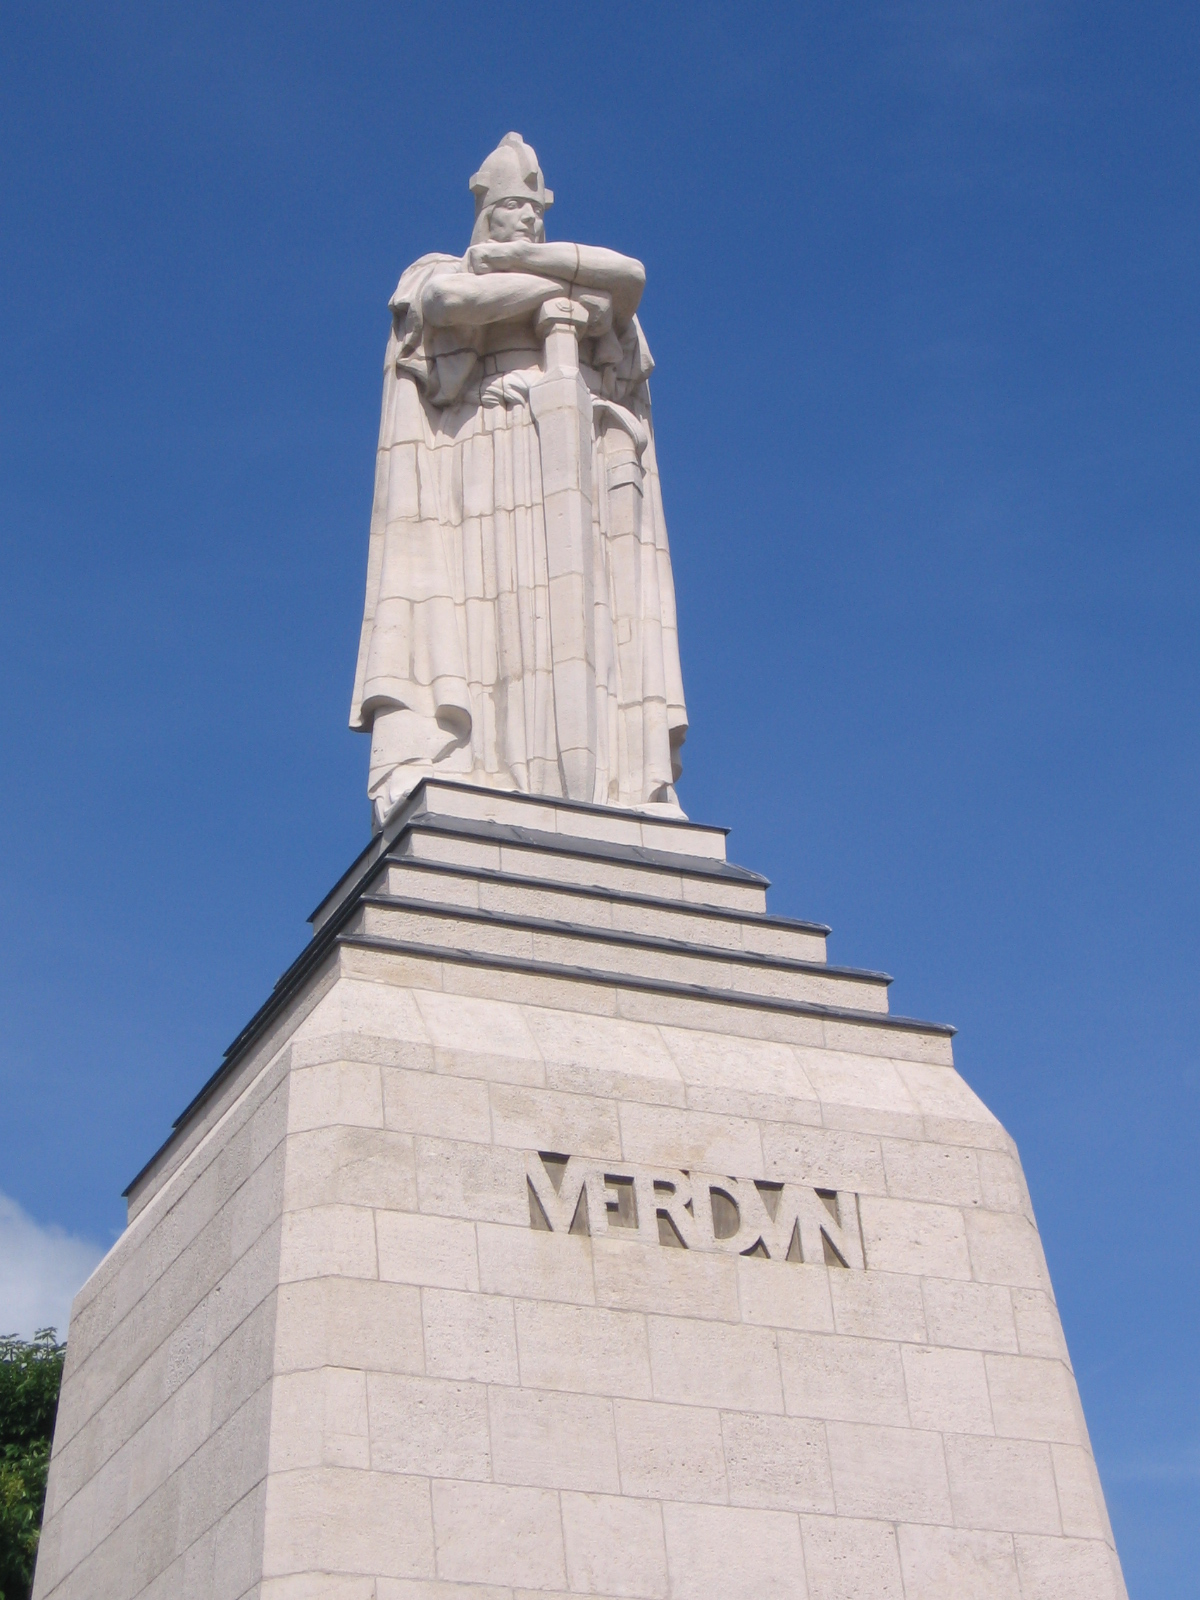 Verdun_4juni2006_043